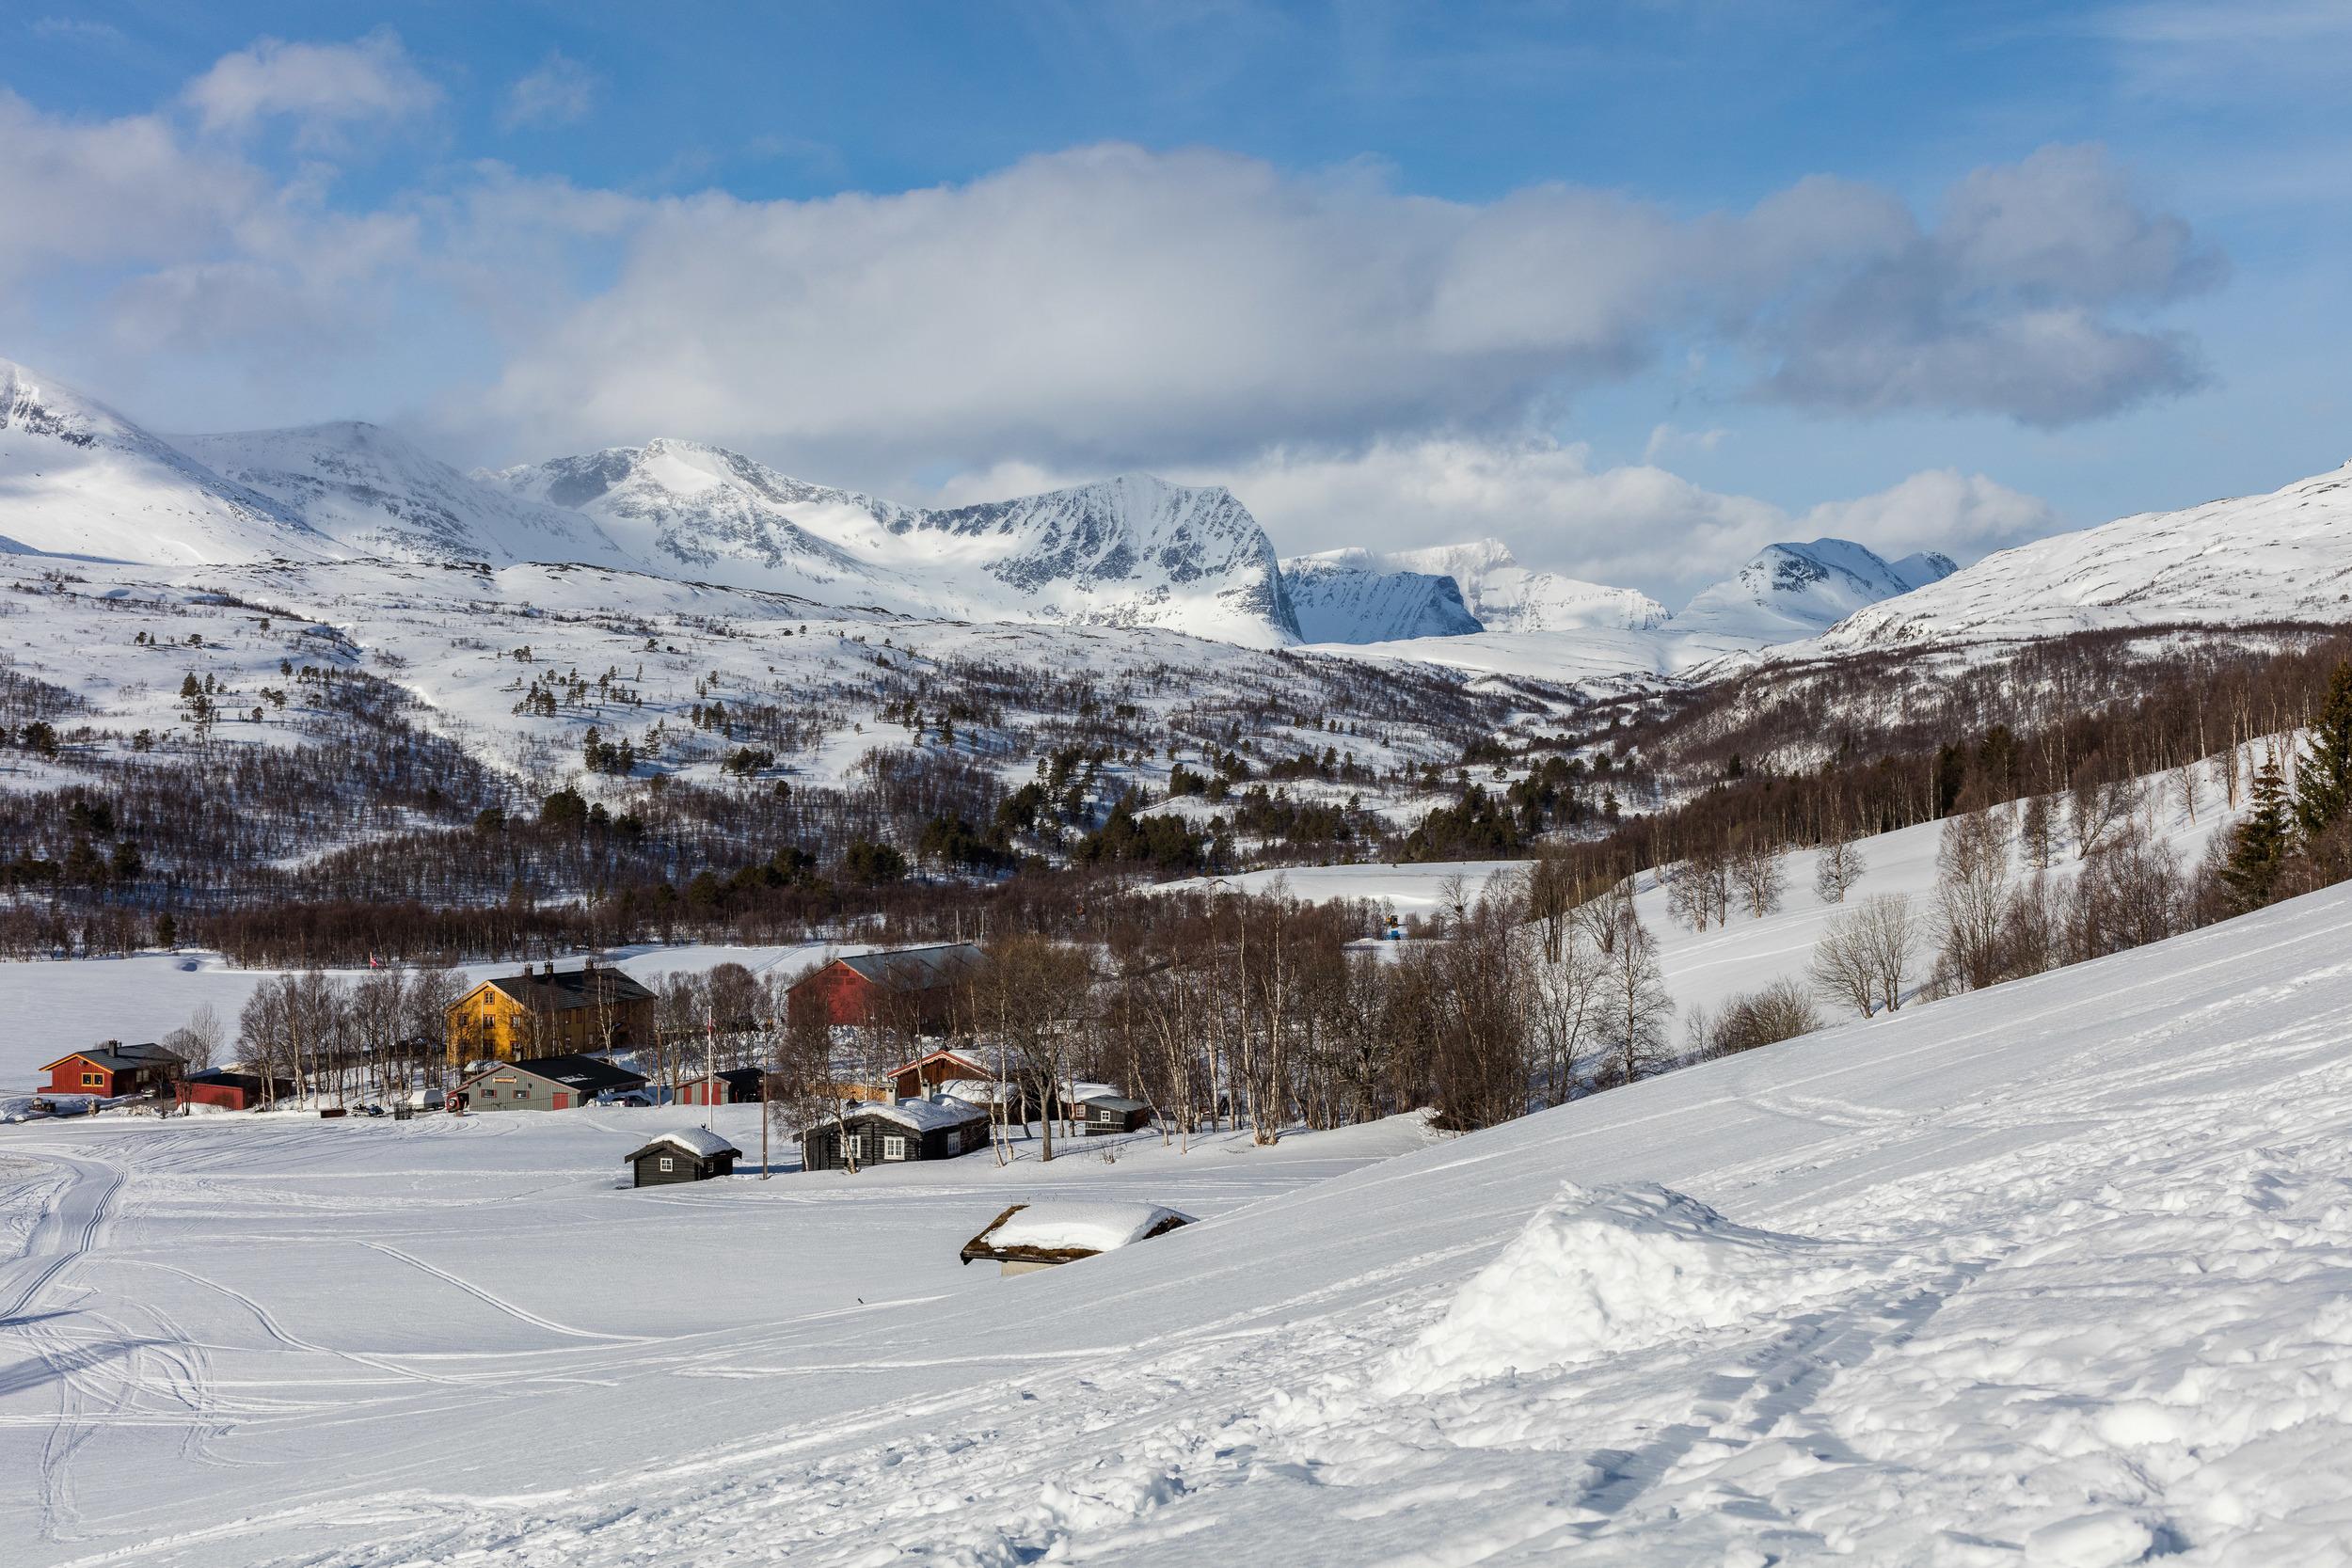 Bortistu-Storlidalen-Oppdal-Norge-Sven-Erik-Knoff-FotoKnoff-85.jpg